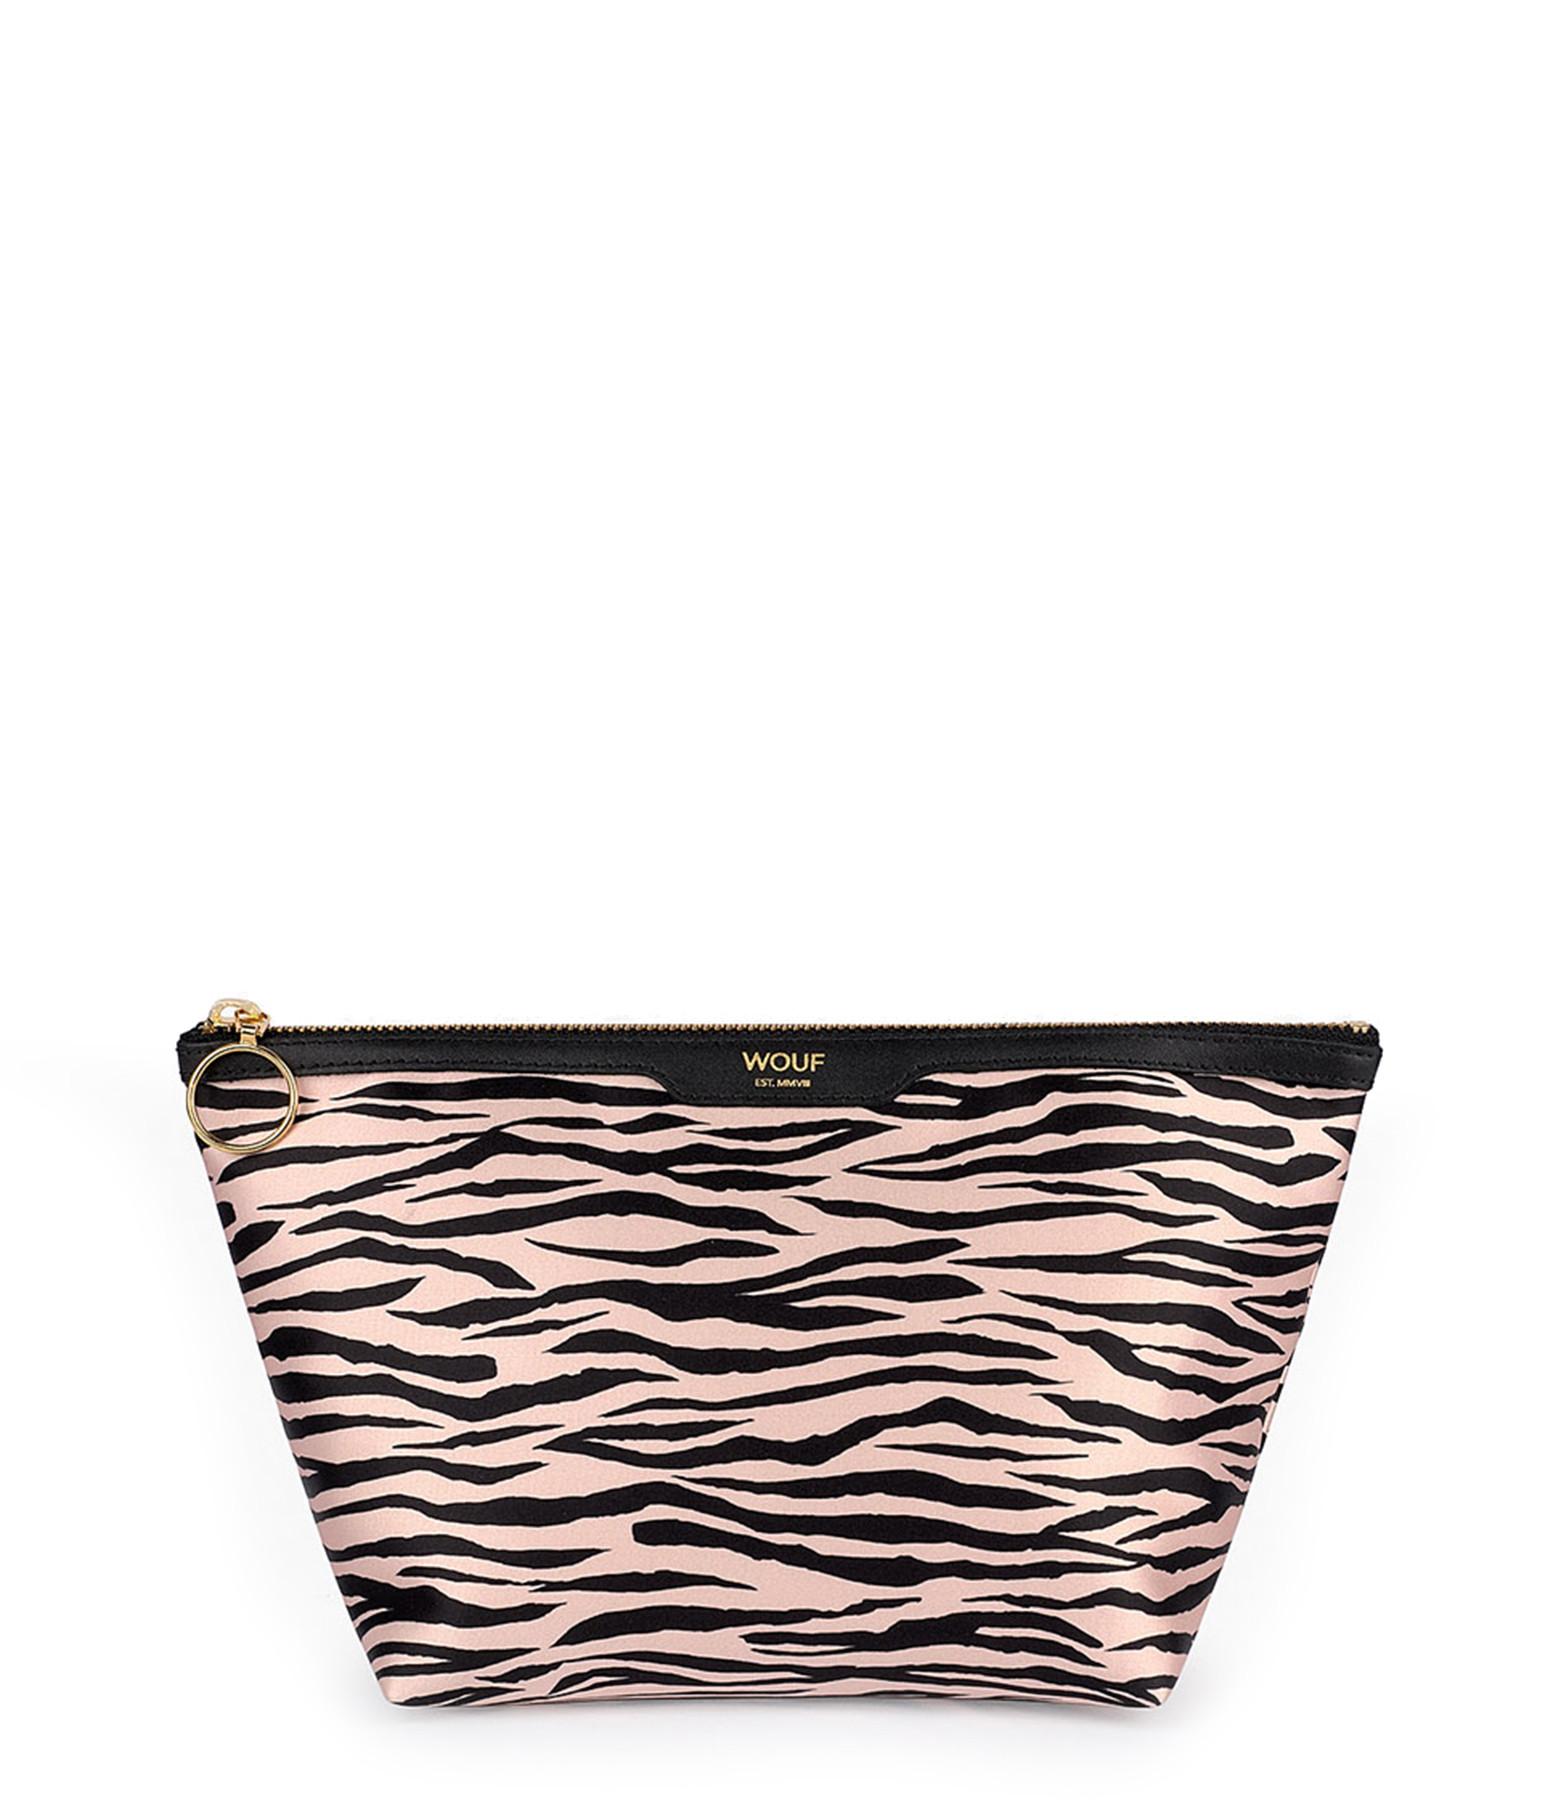 WOUF - Trousse Beauty Satin Soft Tiger